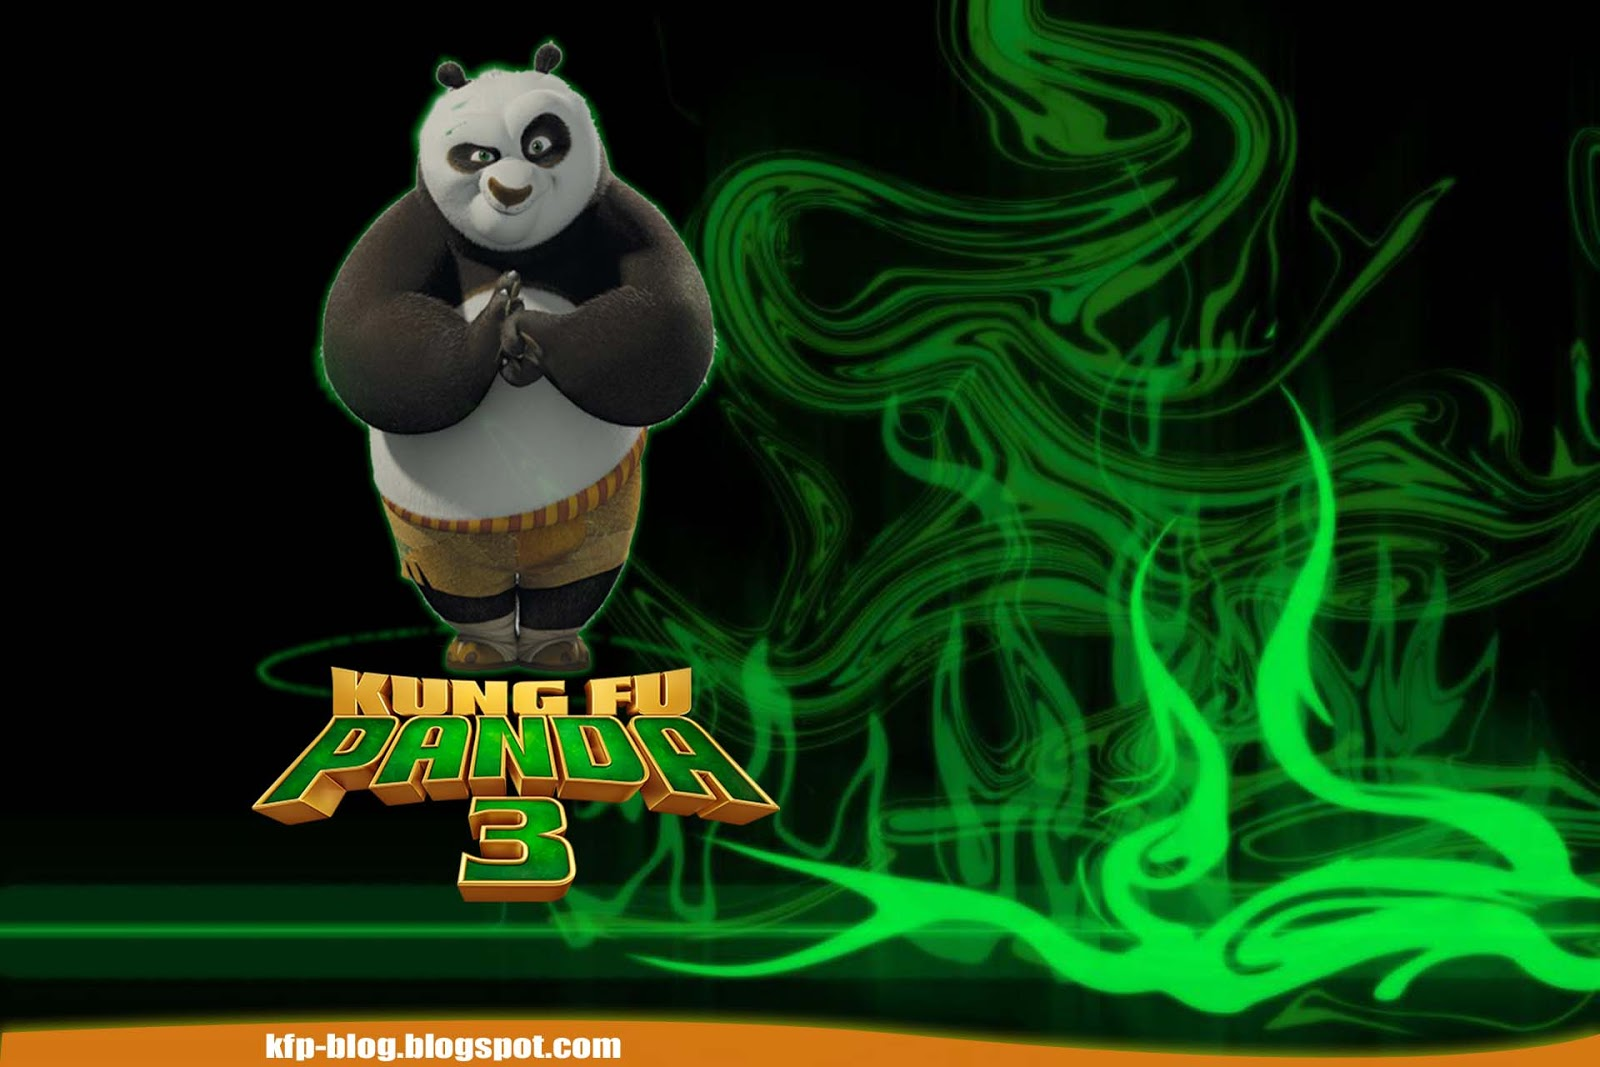 free, movie, download, 2016, ryemovies, ganool, update, Kungfu Panda 3 2016, Cartoon, DreamWorks Animation, Oriental DreamWorks, animation,  Jack Black, Bryan Cranston, Dustin Hoffman, china, tempat download film baru